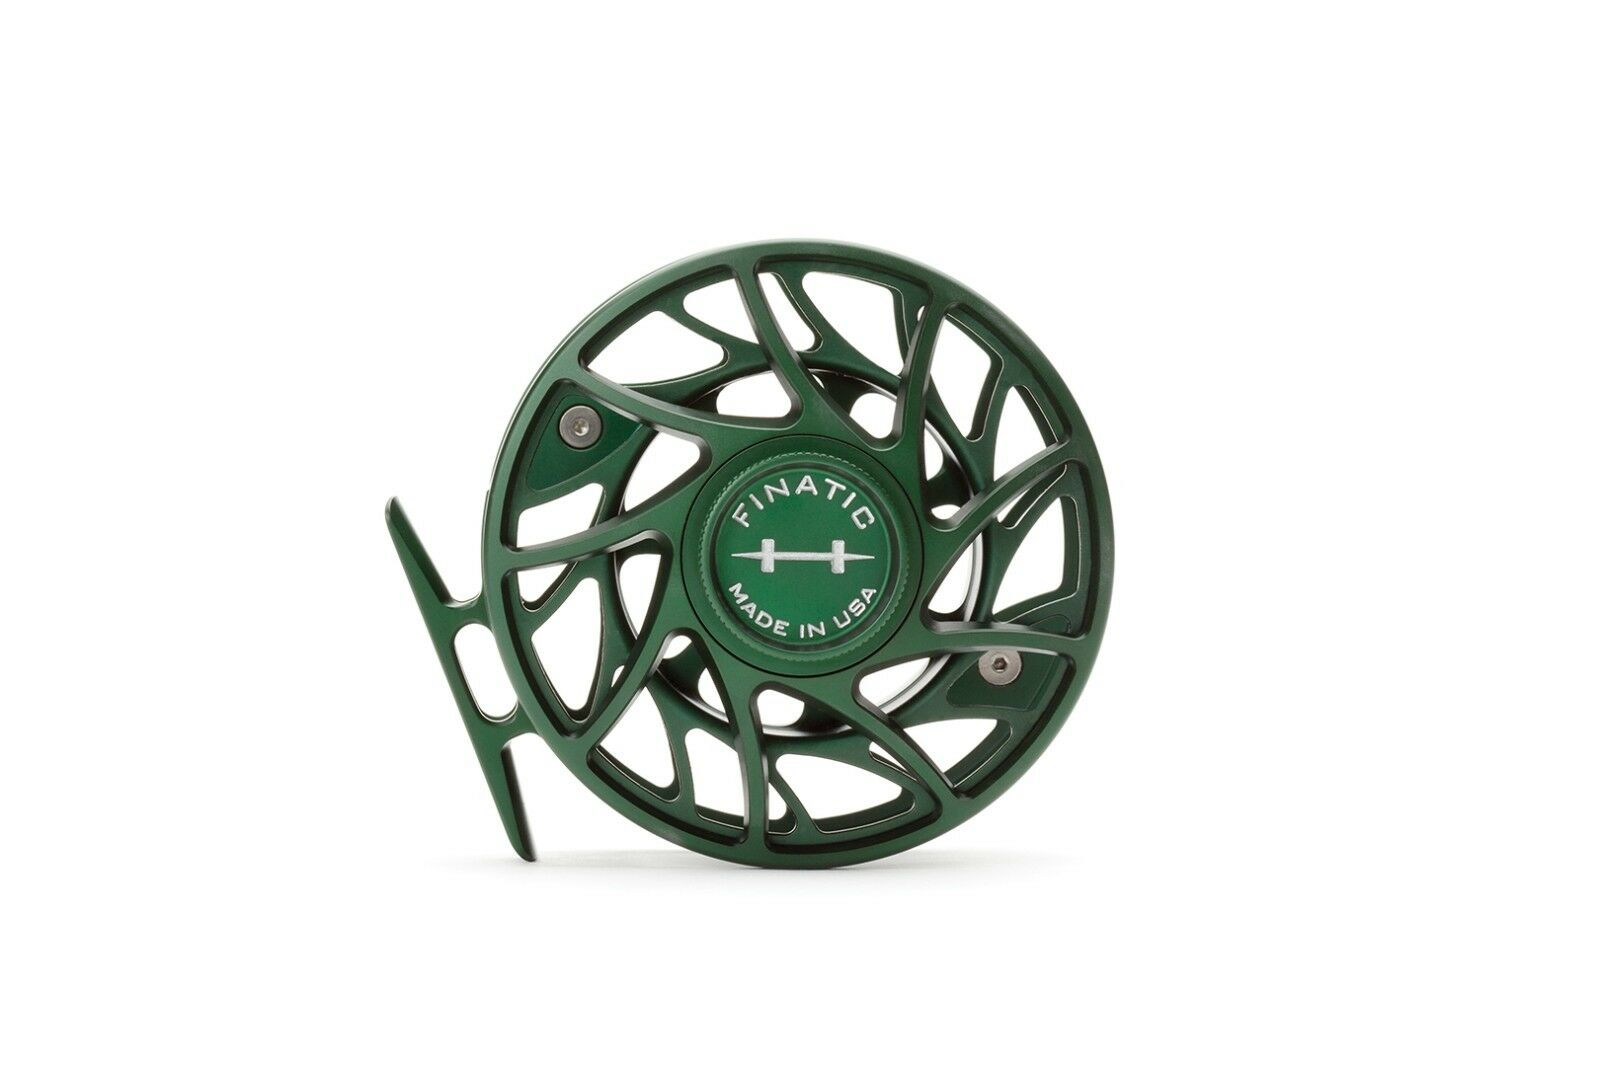 Hatch Green Finatic 4 Plus Gen 2 Fly Reel Large Arbor - Streams of Dreams Fly